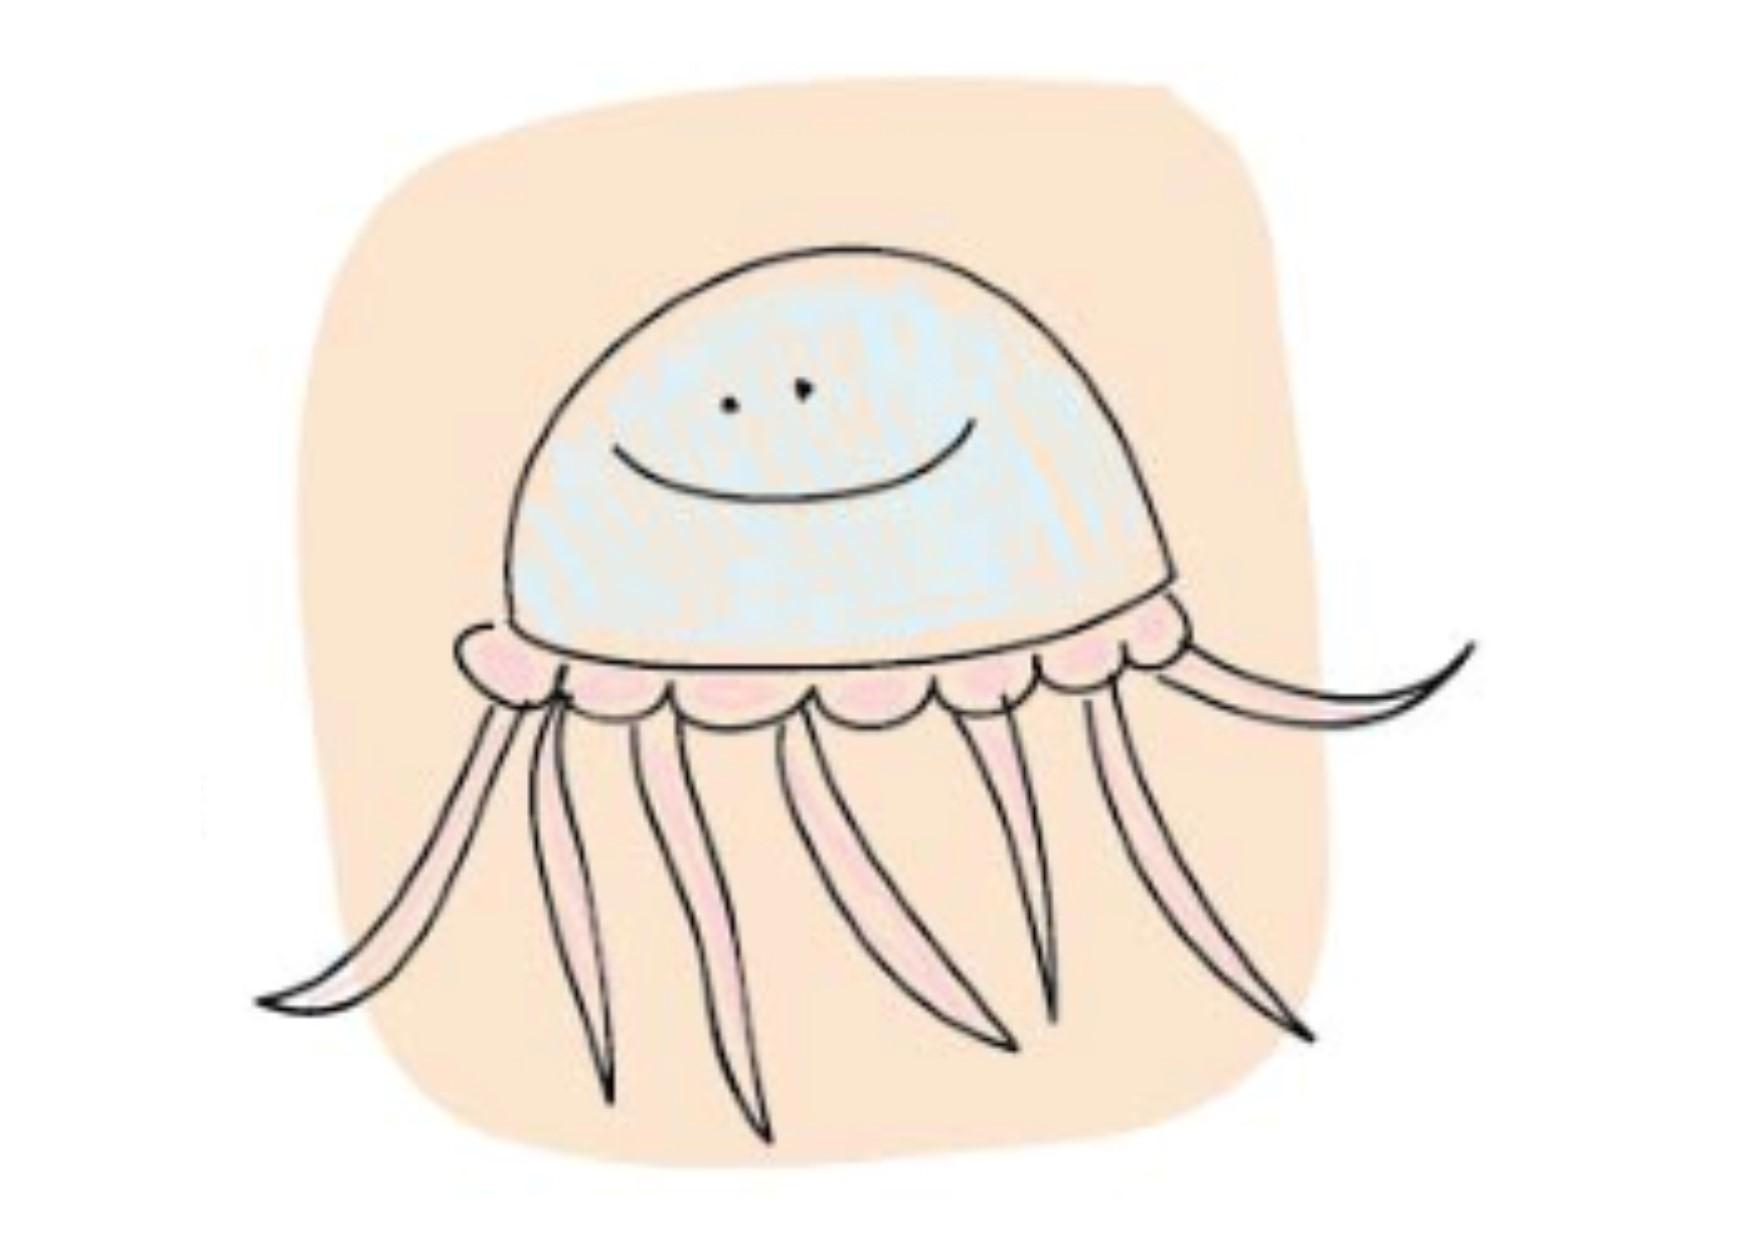 у медуз нет сердца картинки место